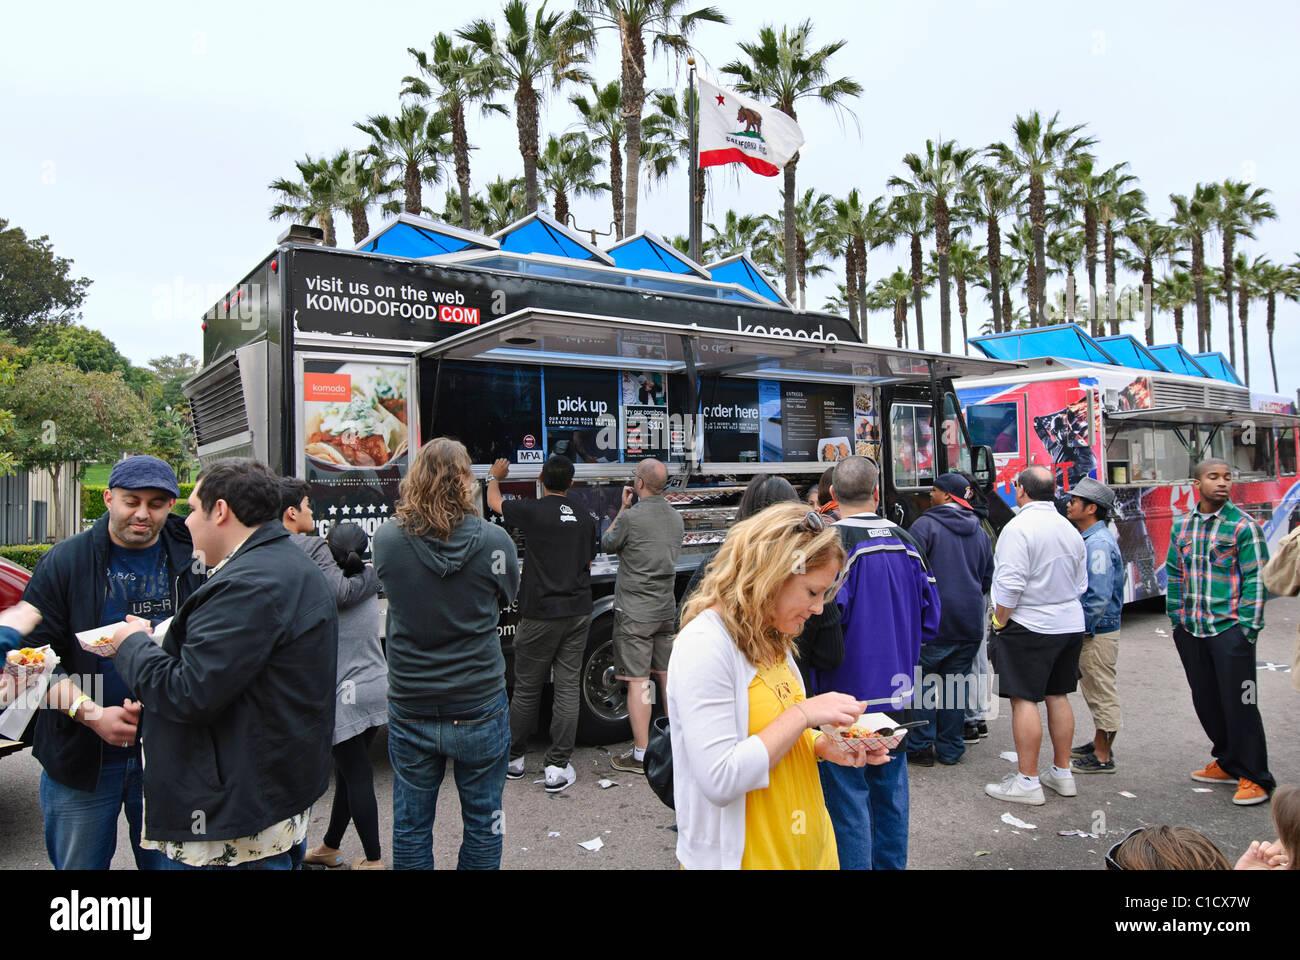 Food truck festival. - Stock Image